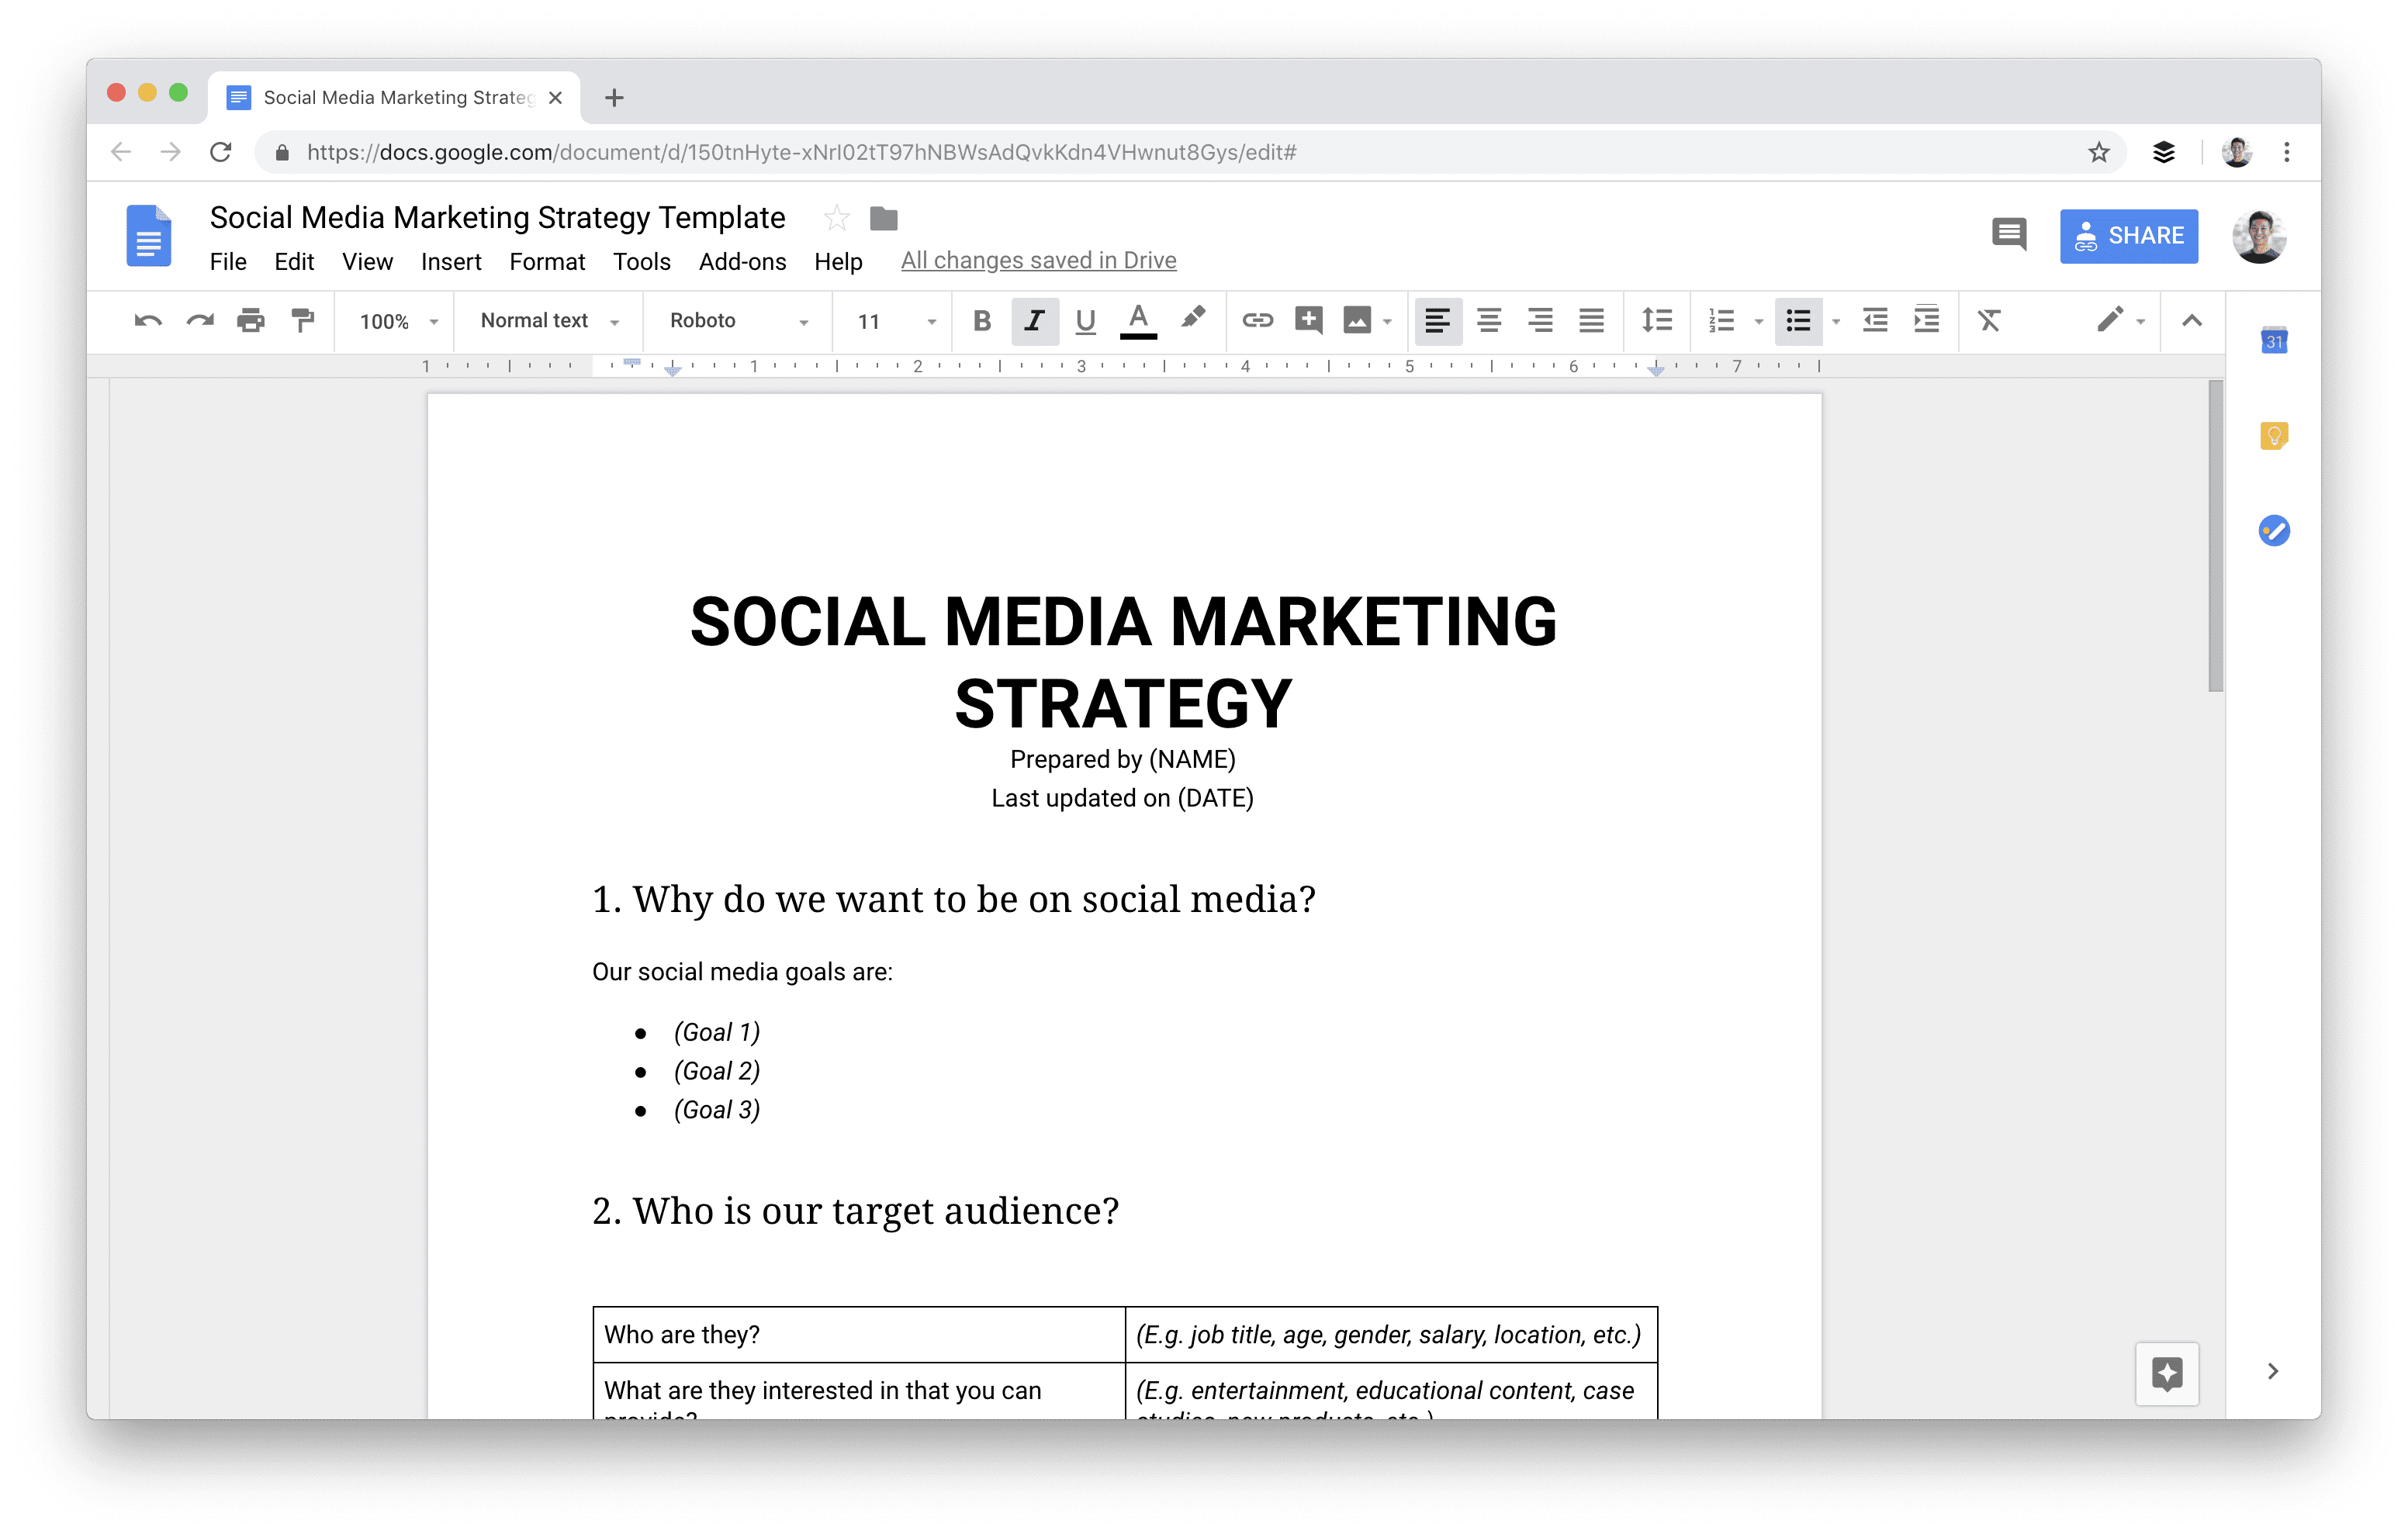 Social media marketing strategy template